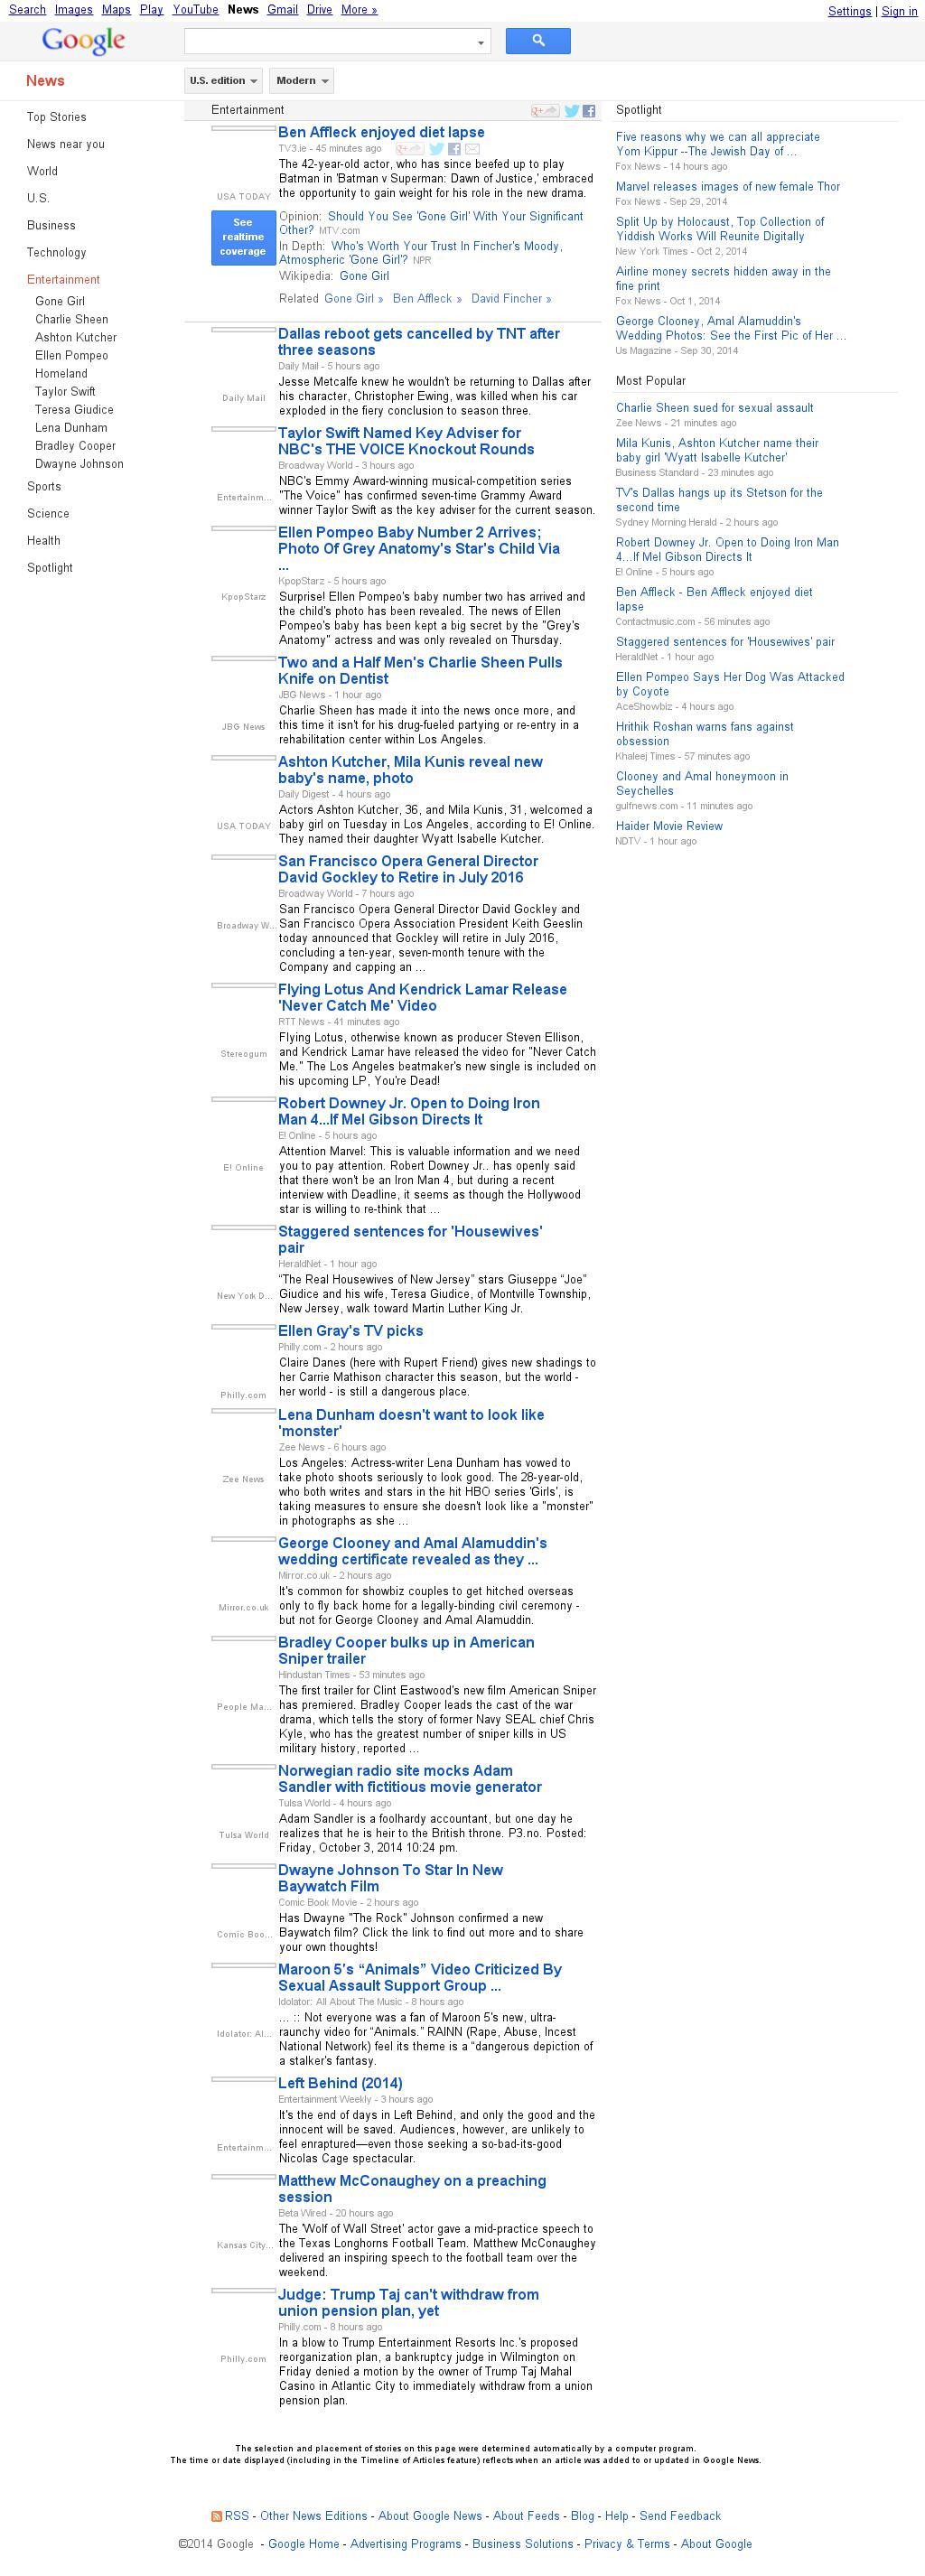 Google News: Entertainment at Saturday Oct. 4, 2014, 9:06 a.m. UTC